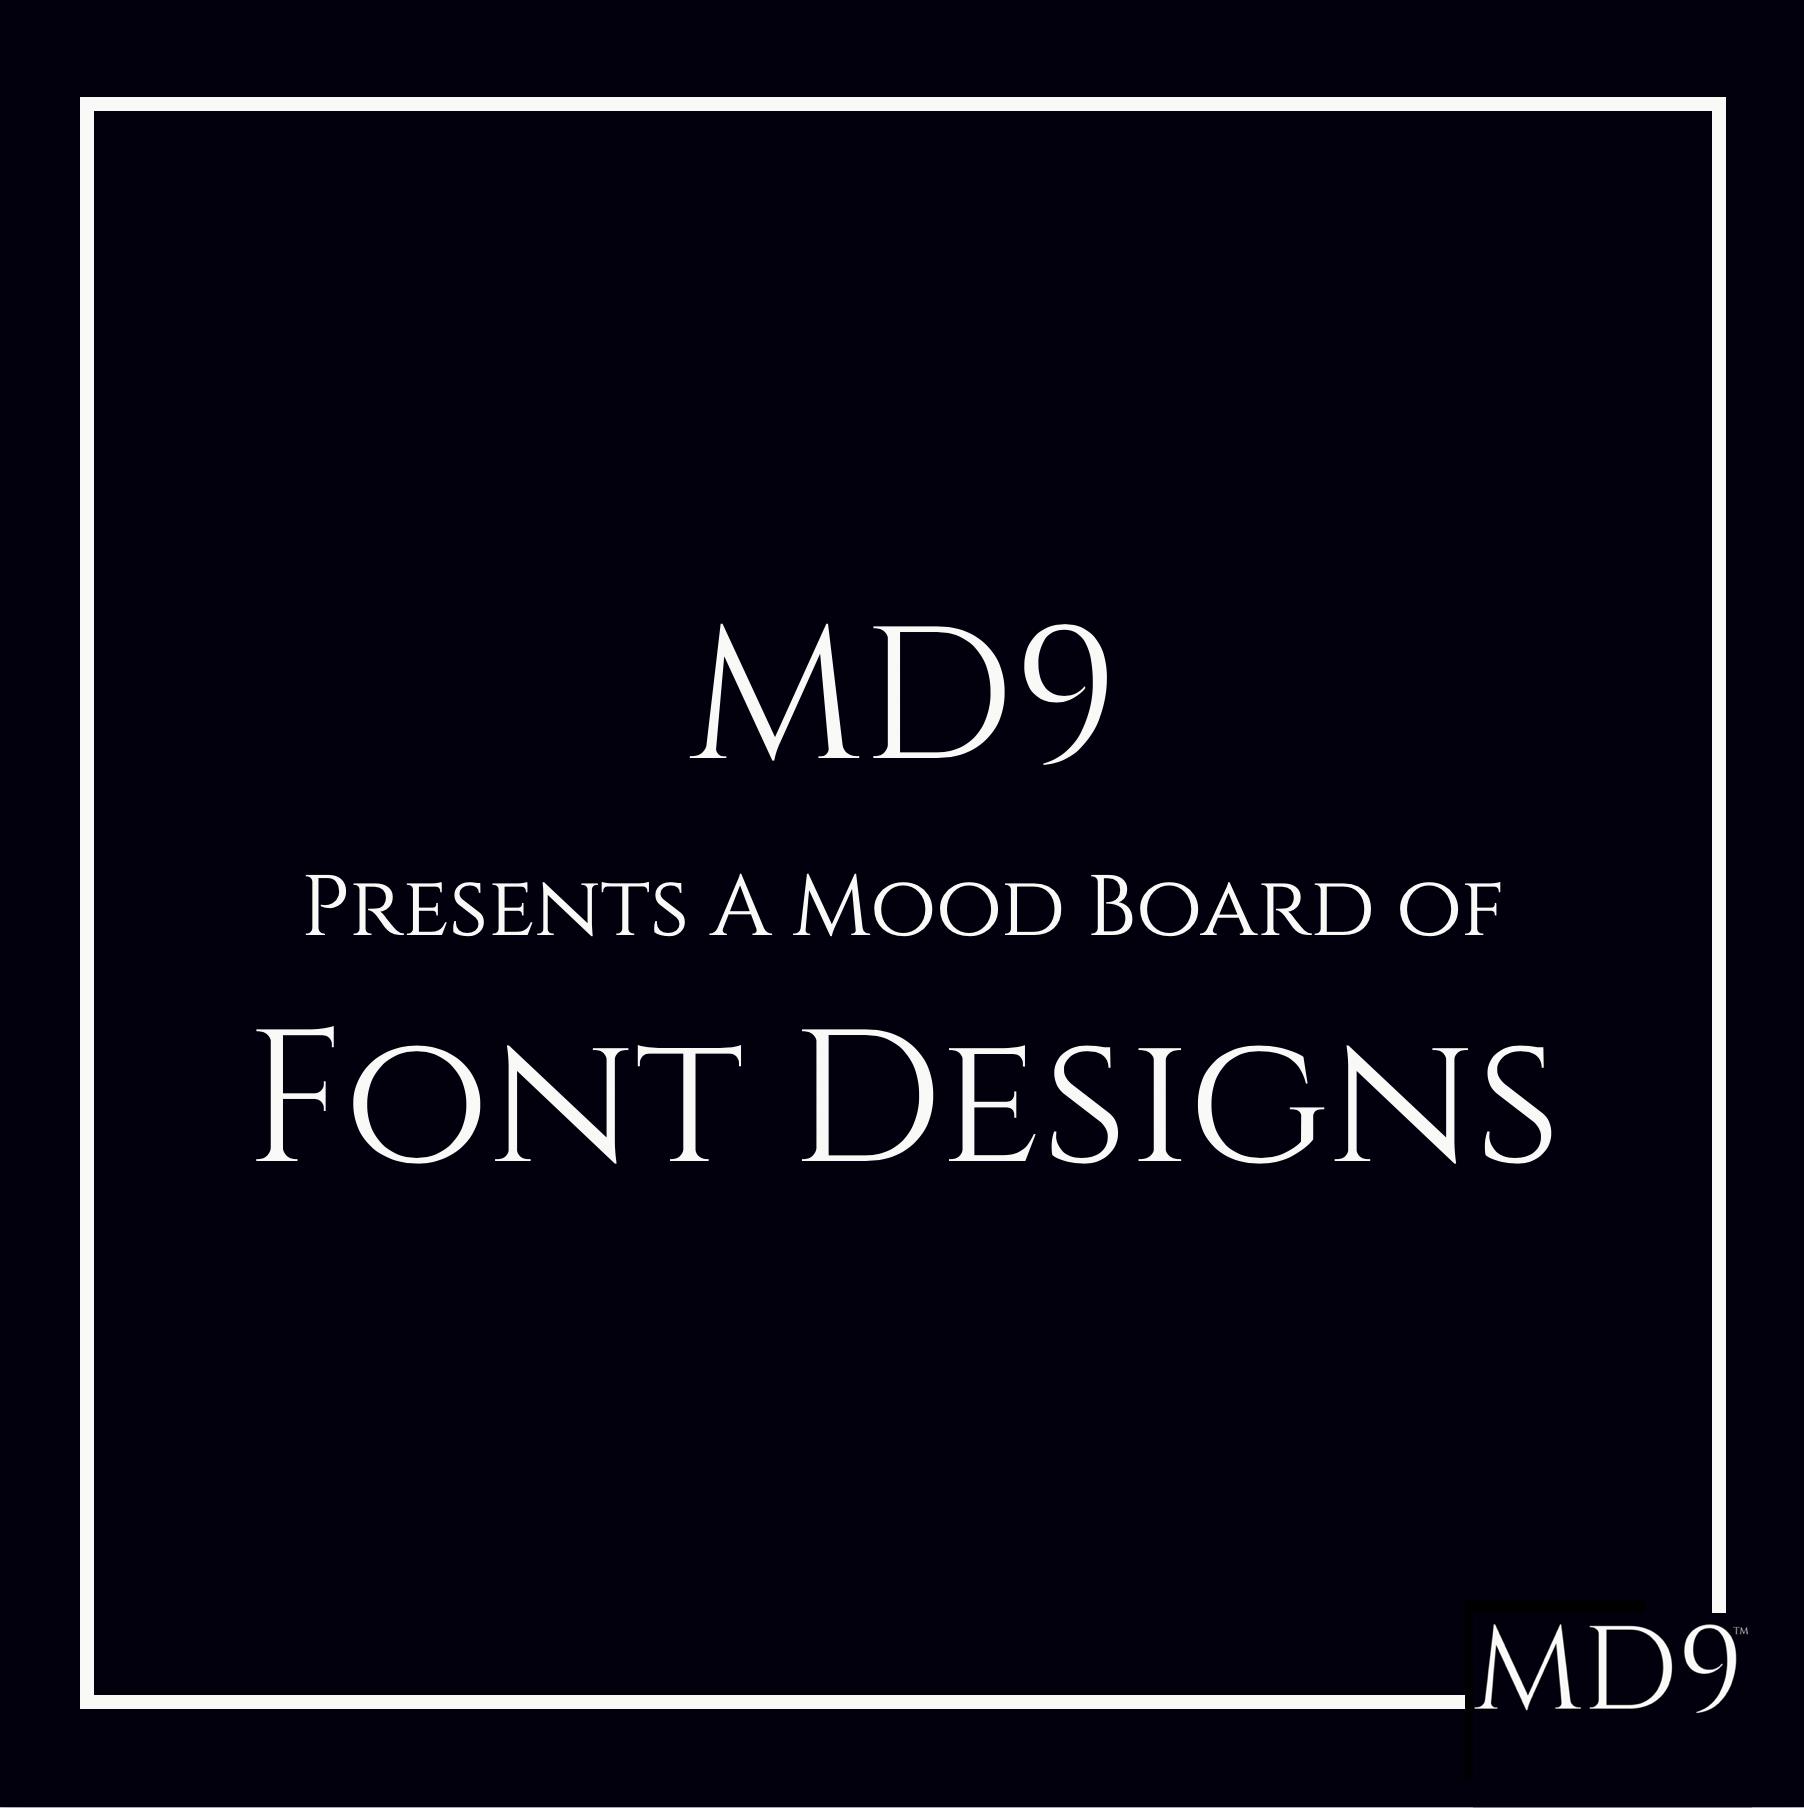 MD9's Design Mood Board – Fonts